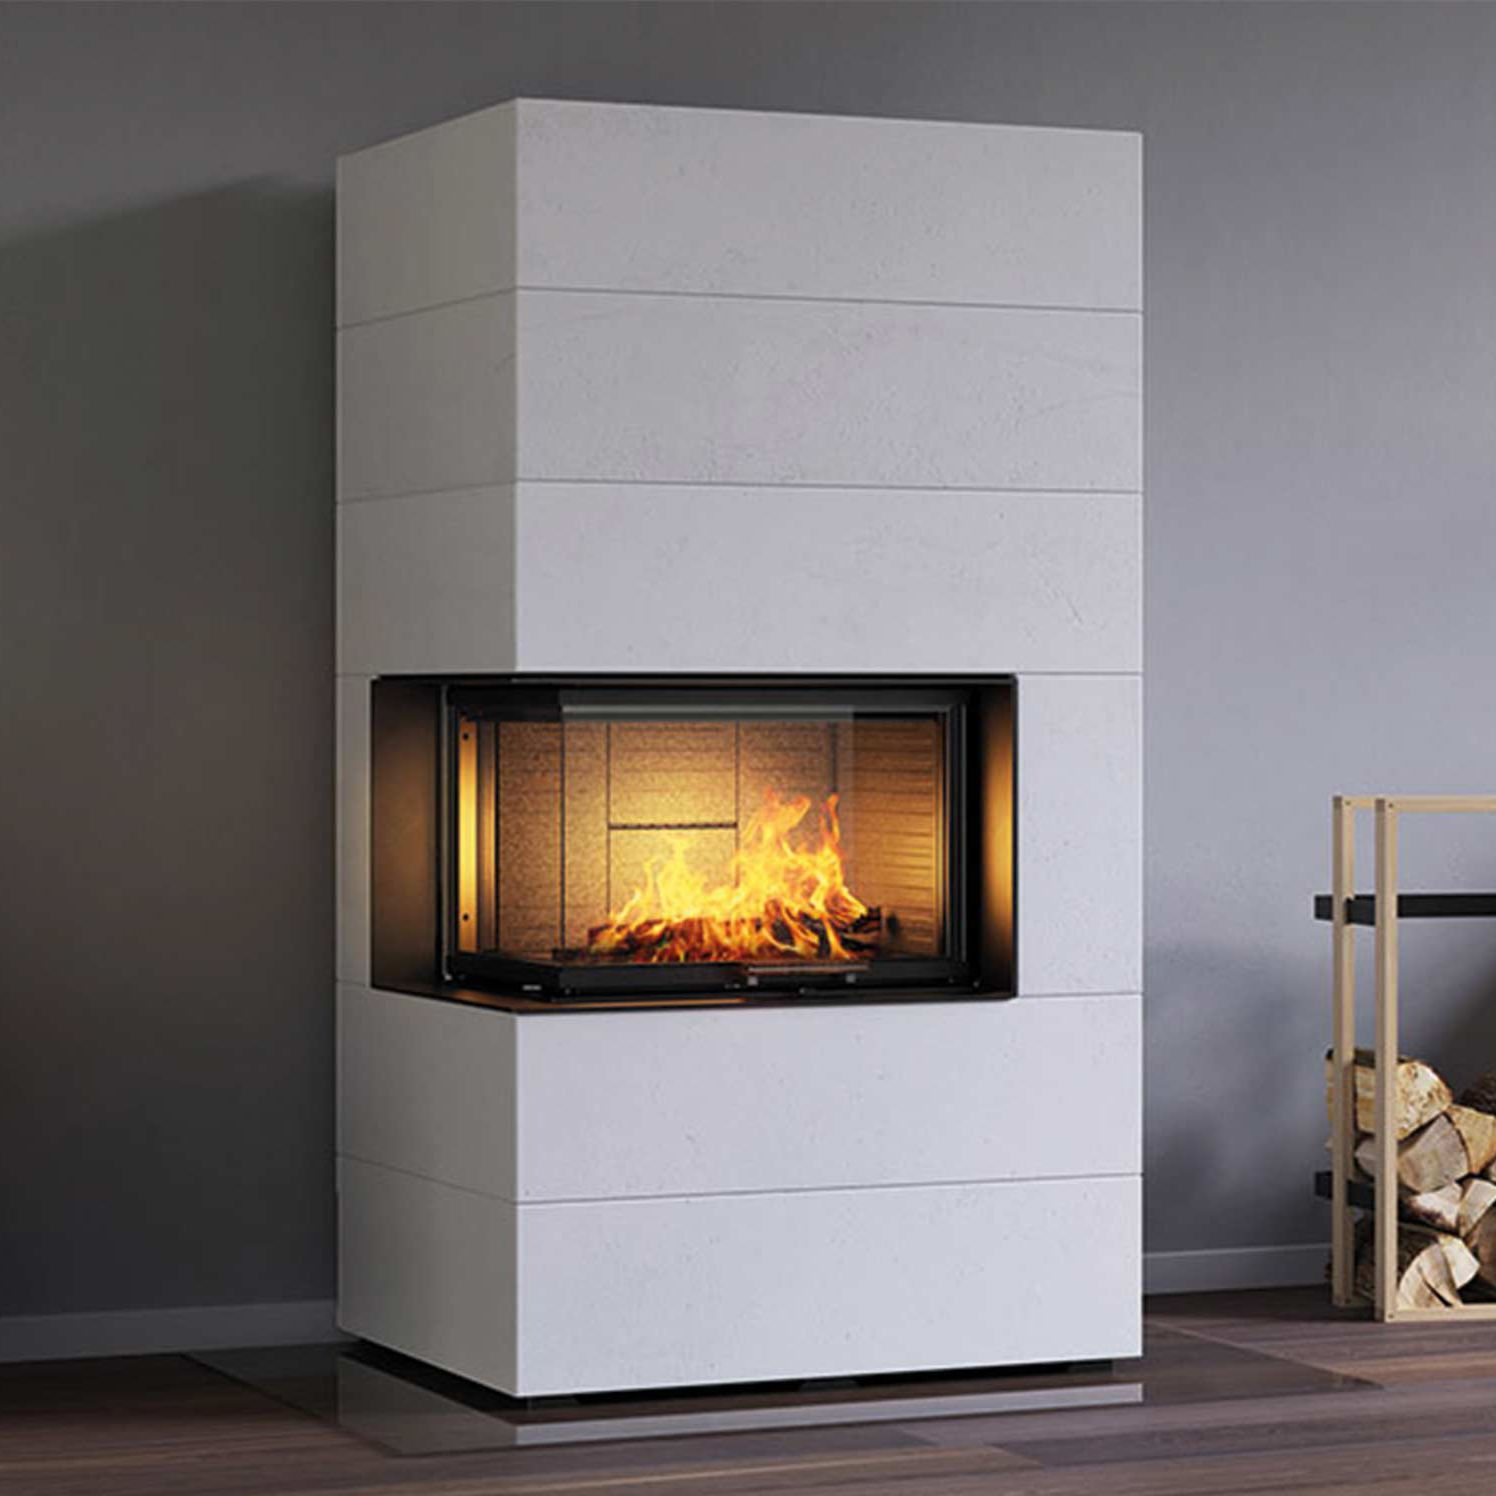 Wood Burning Fireplace Insert Corner Visio 2 Element Attika